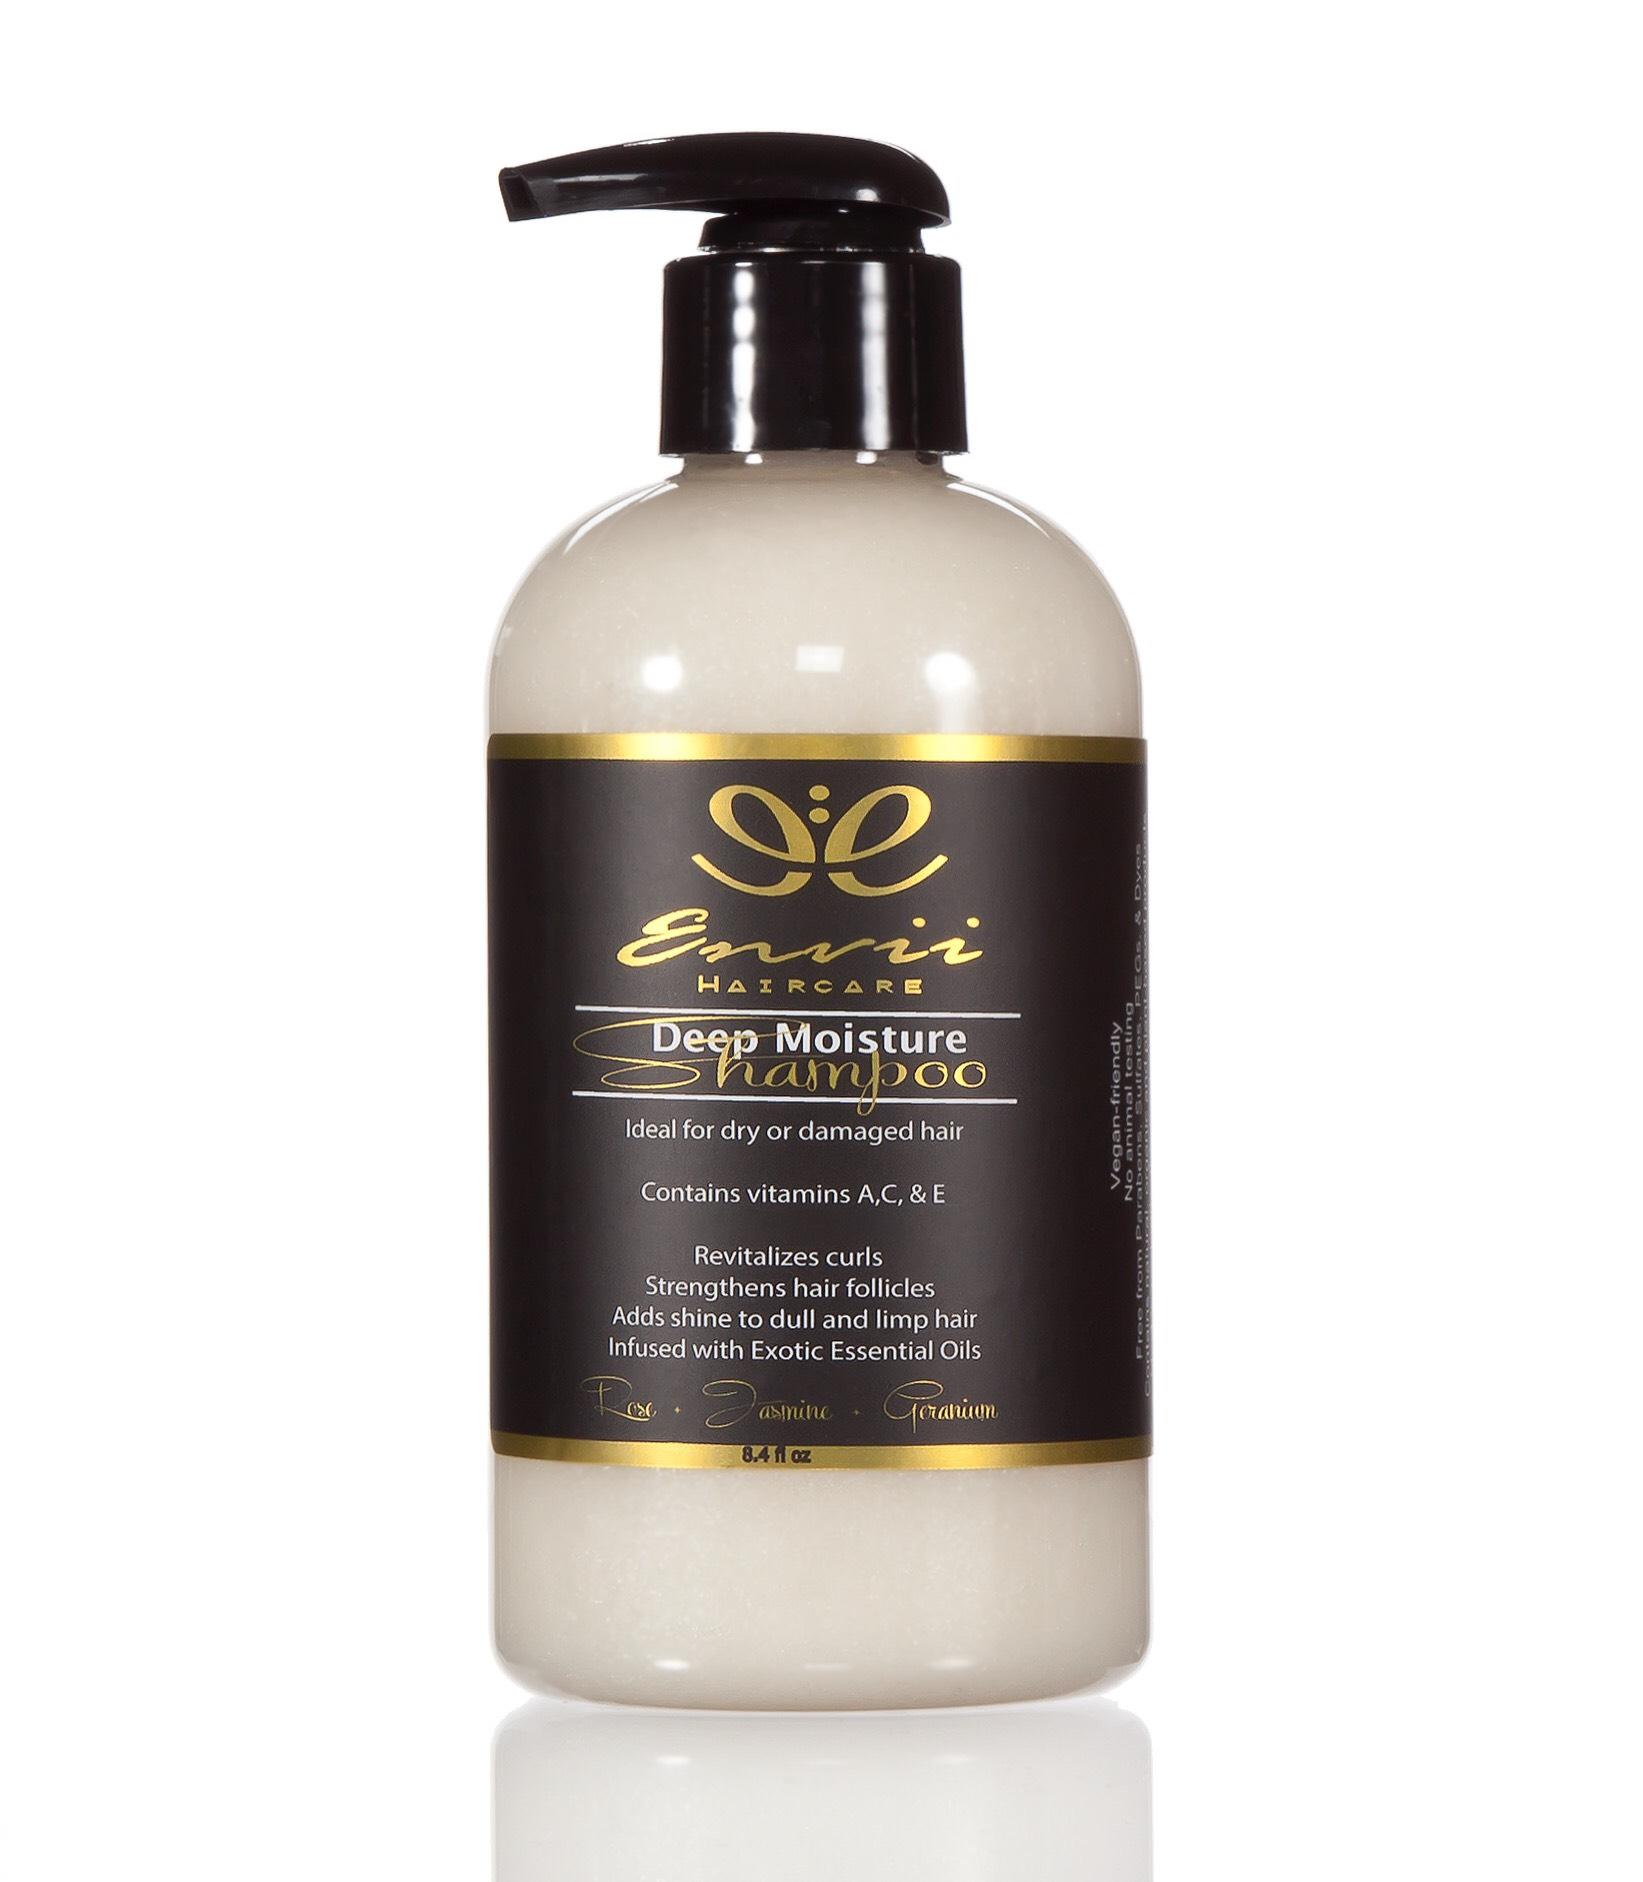 rose shampoo, sulfate-free shampoo, handmade shampoo, Jasmine shampoo, Geranium shampoo